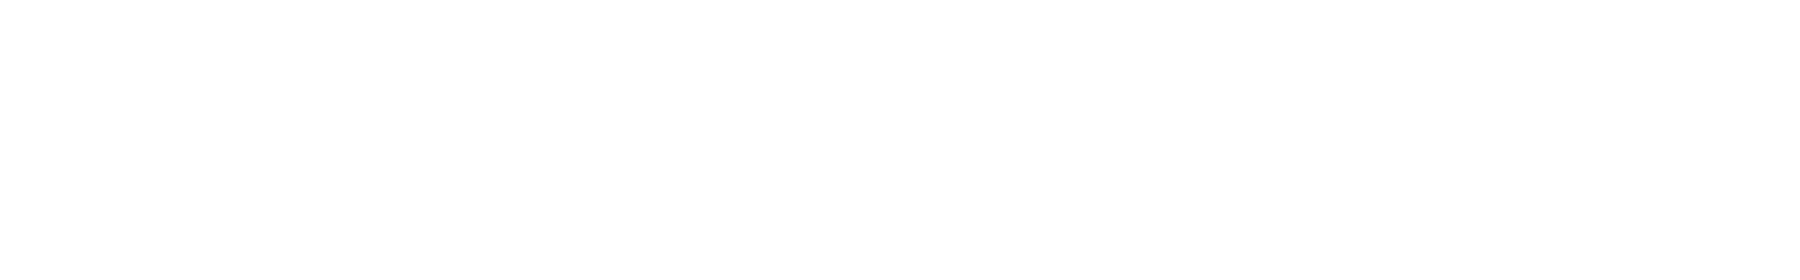 20170119 02 130bpm amin   spheres 004